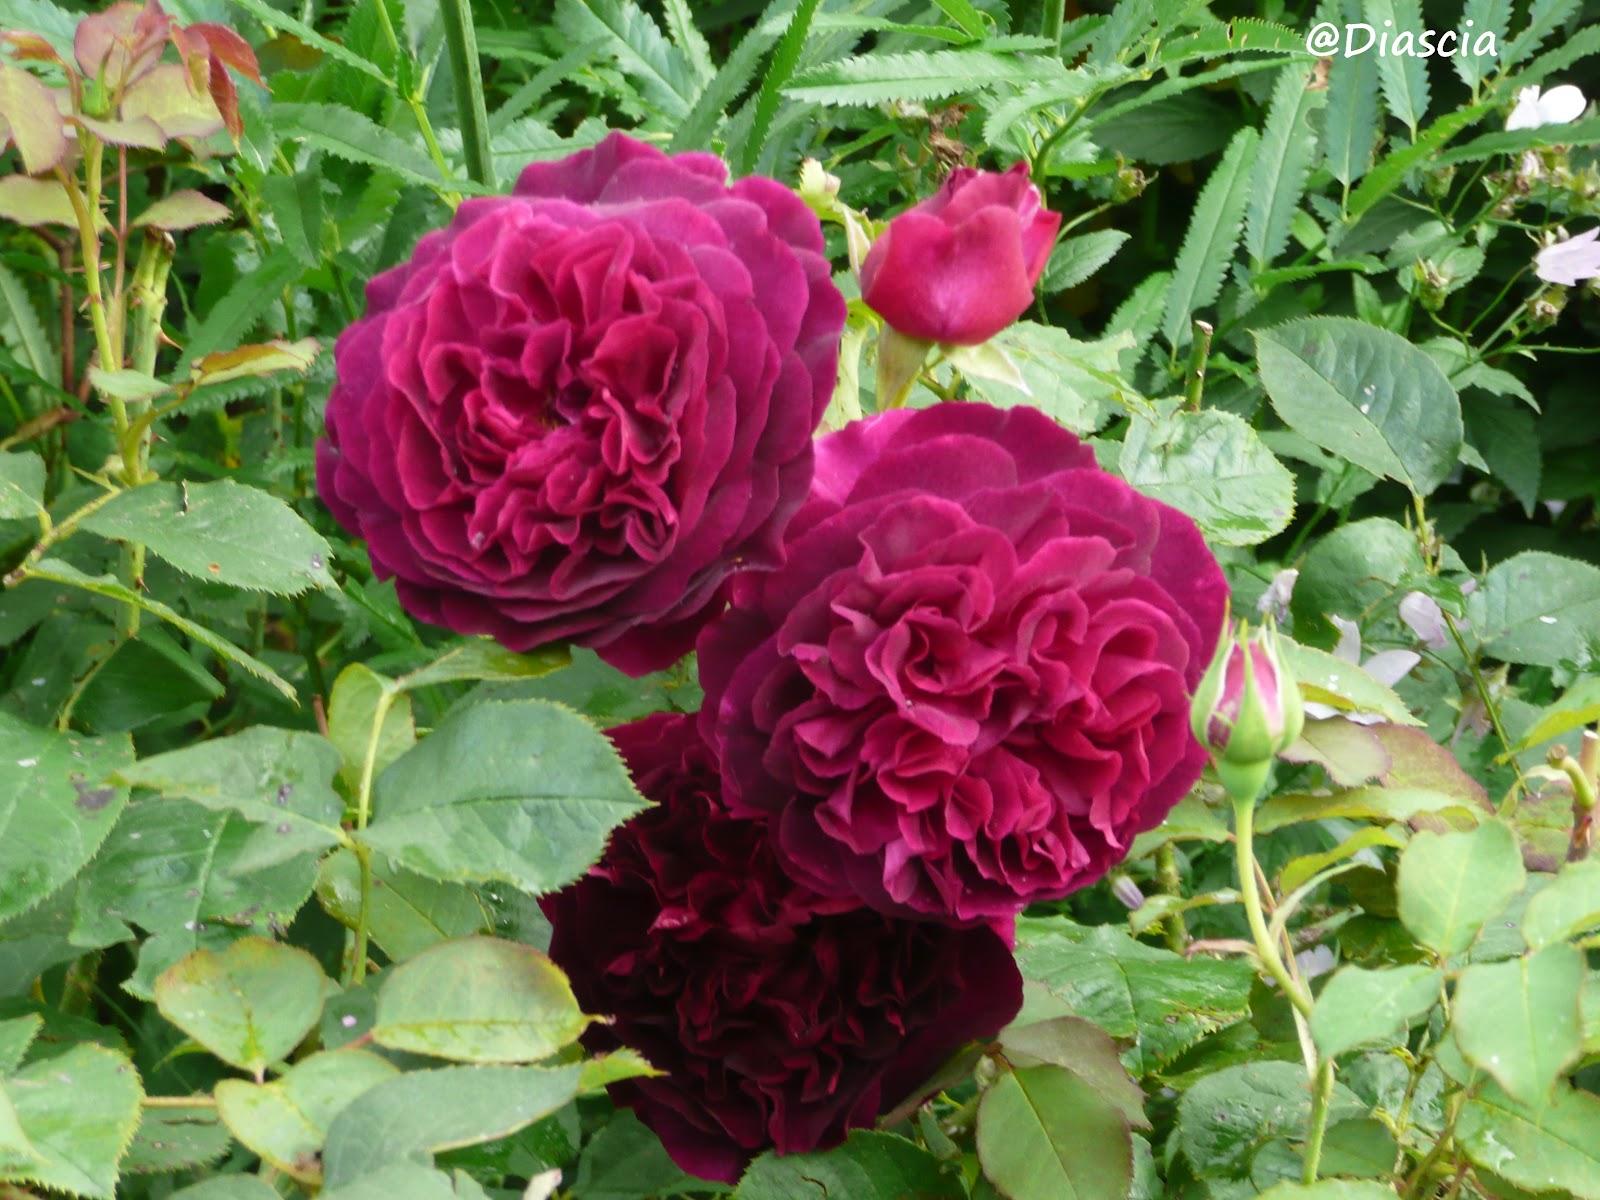 Le jardin de diascia munstead wood - Deplacer un rosier ...